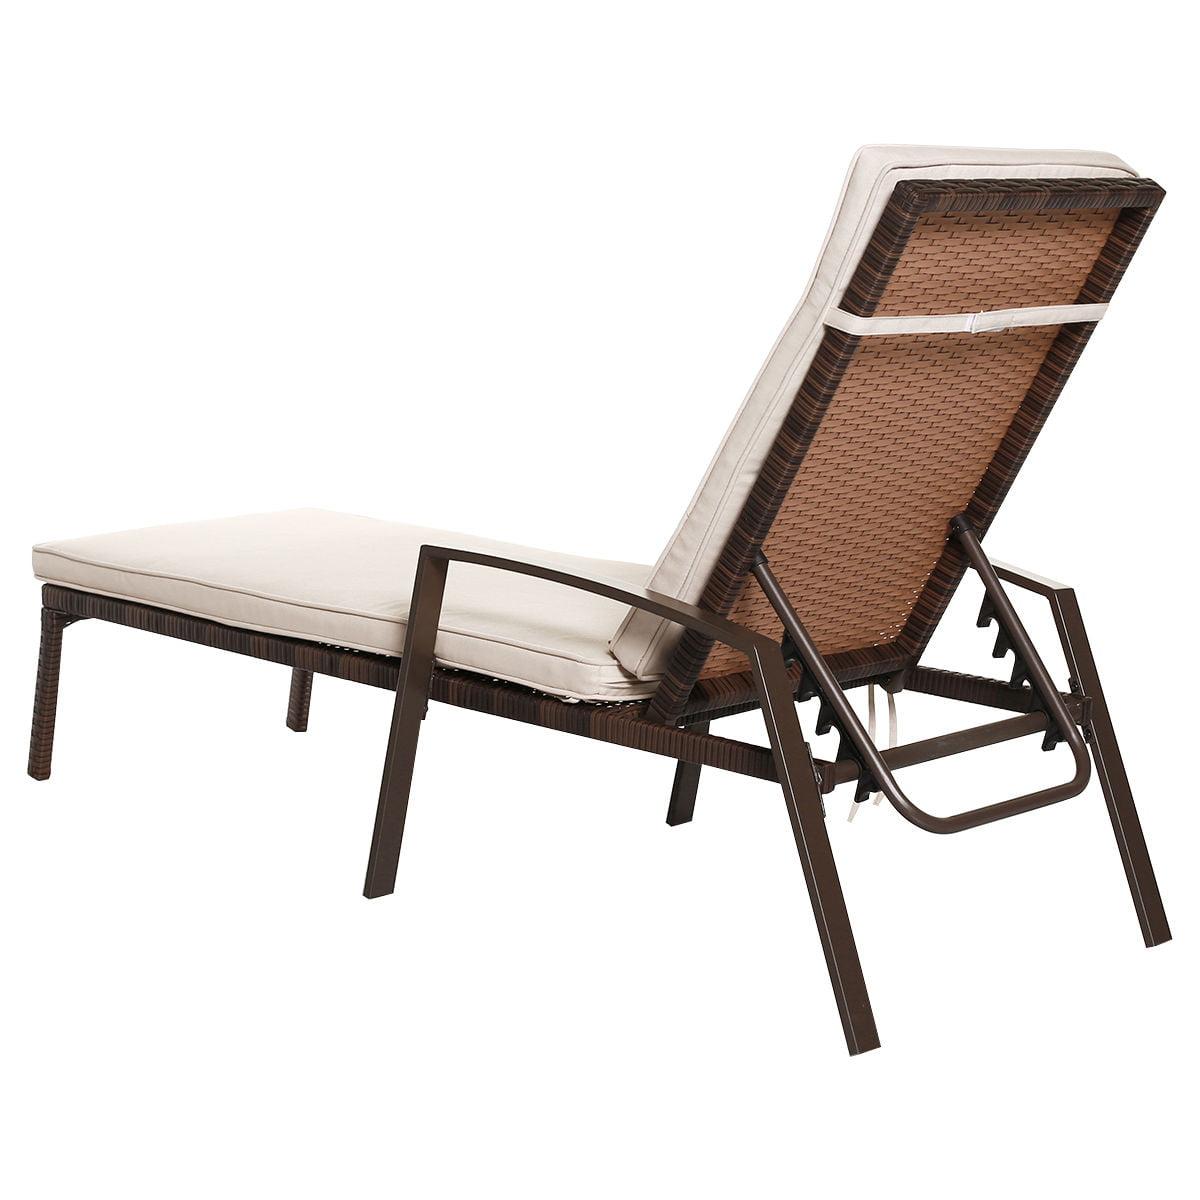 2pcs Patio Rattan Lounge Chair Garden Furniture Adjustable Back W/ Cushion - image 8 of 10